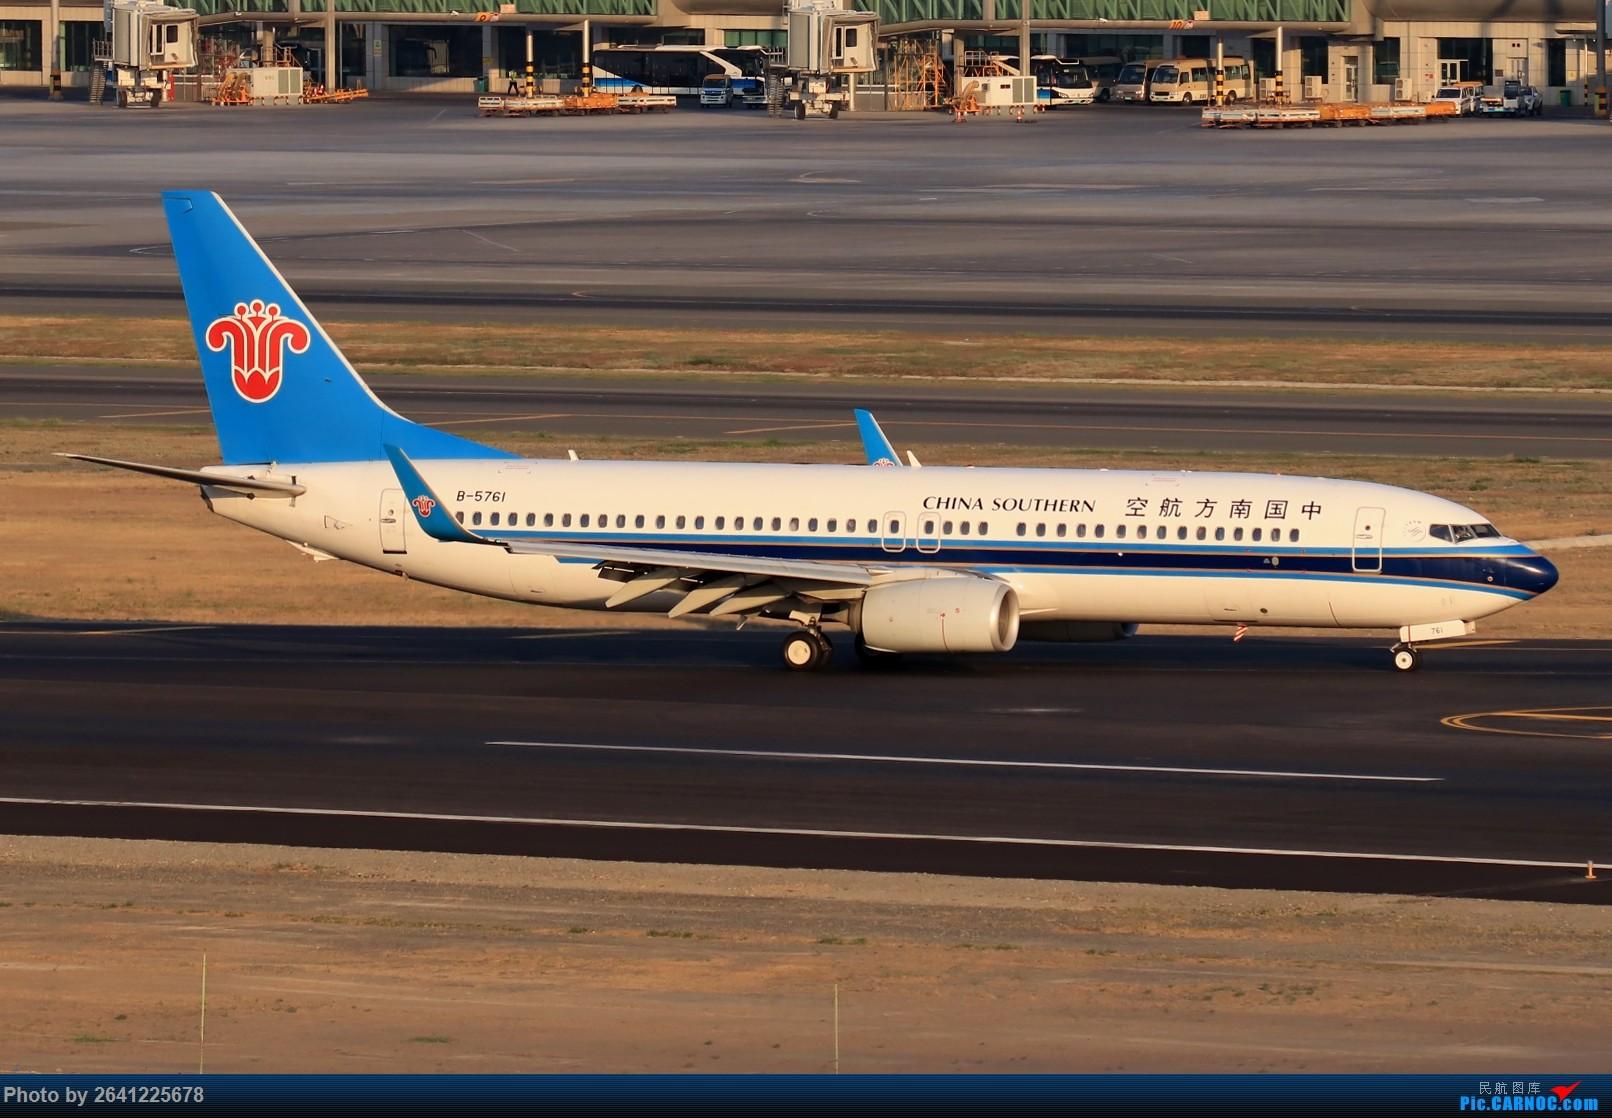 Re:[原创]【小周游记第7集拍机贴】乌鲁木齐绝美的地景和光线 BOEING 737-800 B-5761 中国乌鲁木齐地窝堡国际机场